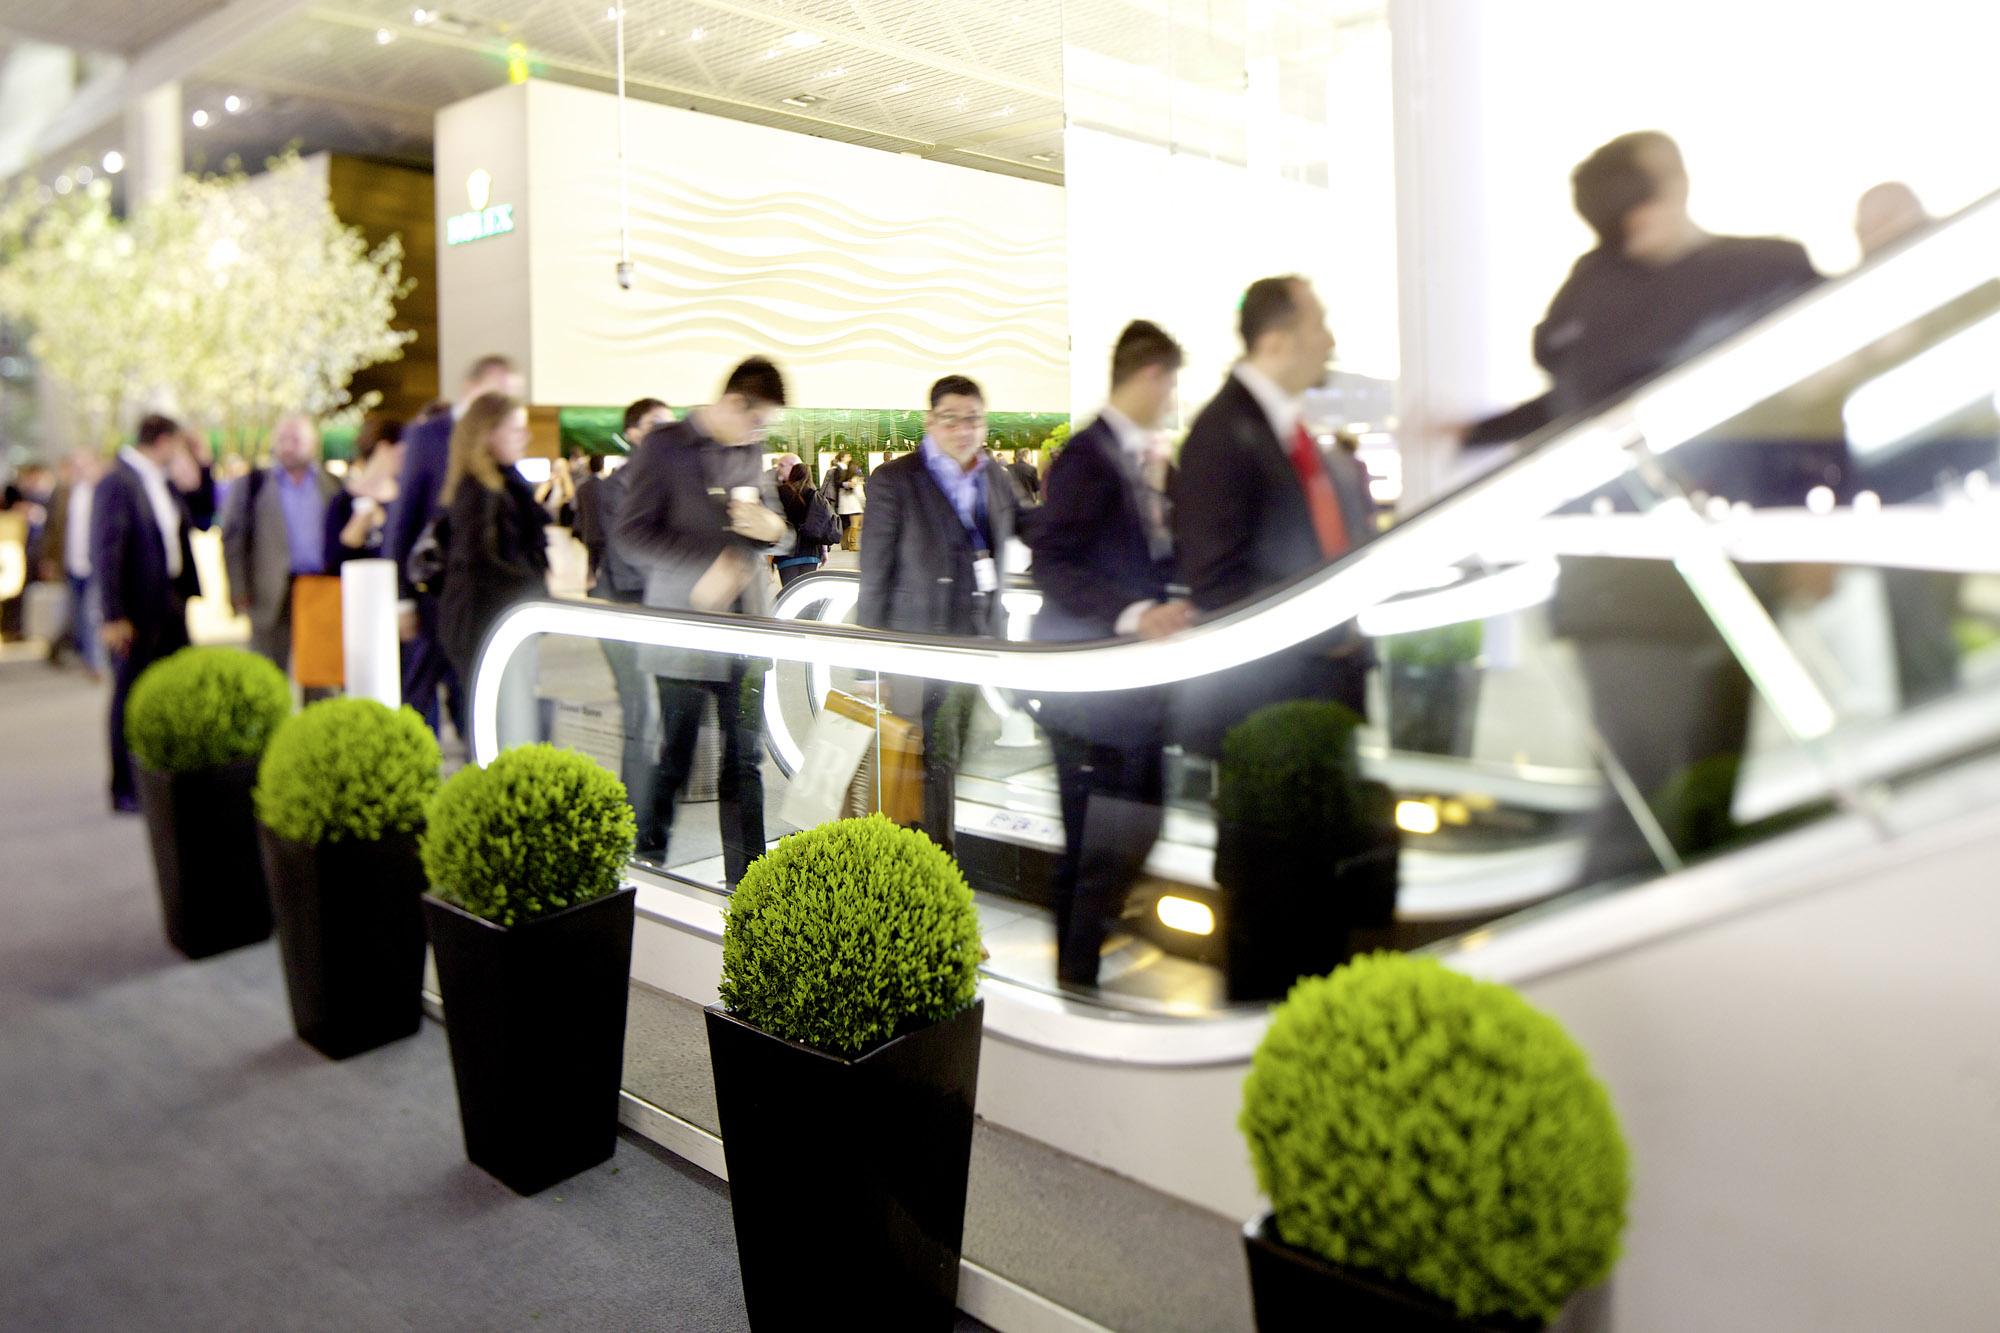 BASELWORLD 2014 | Global Brands | Hall 1.0 | Impression